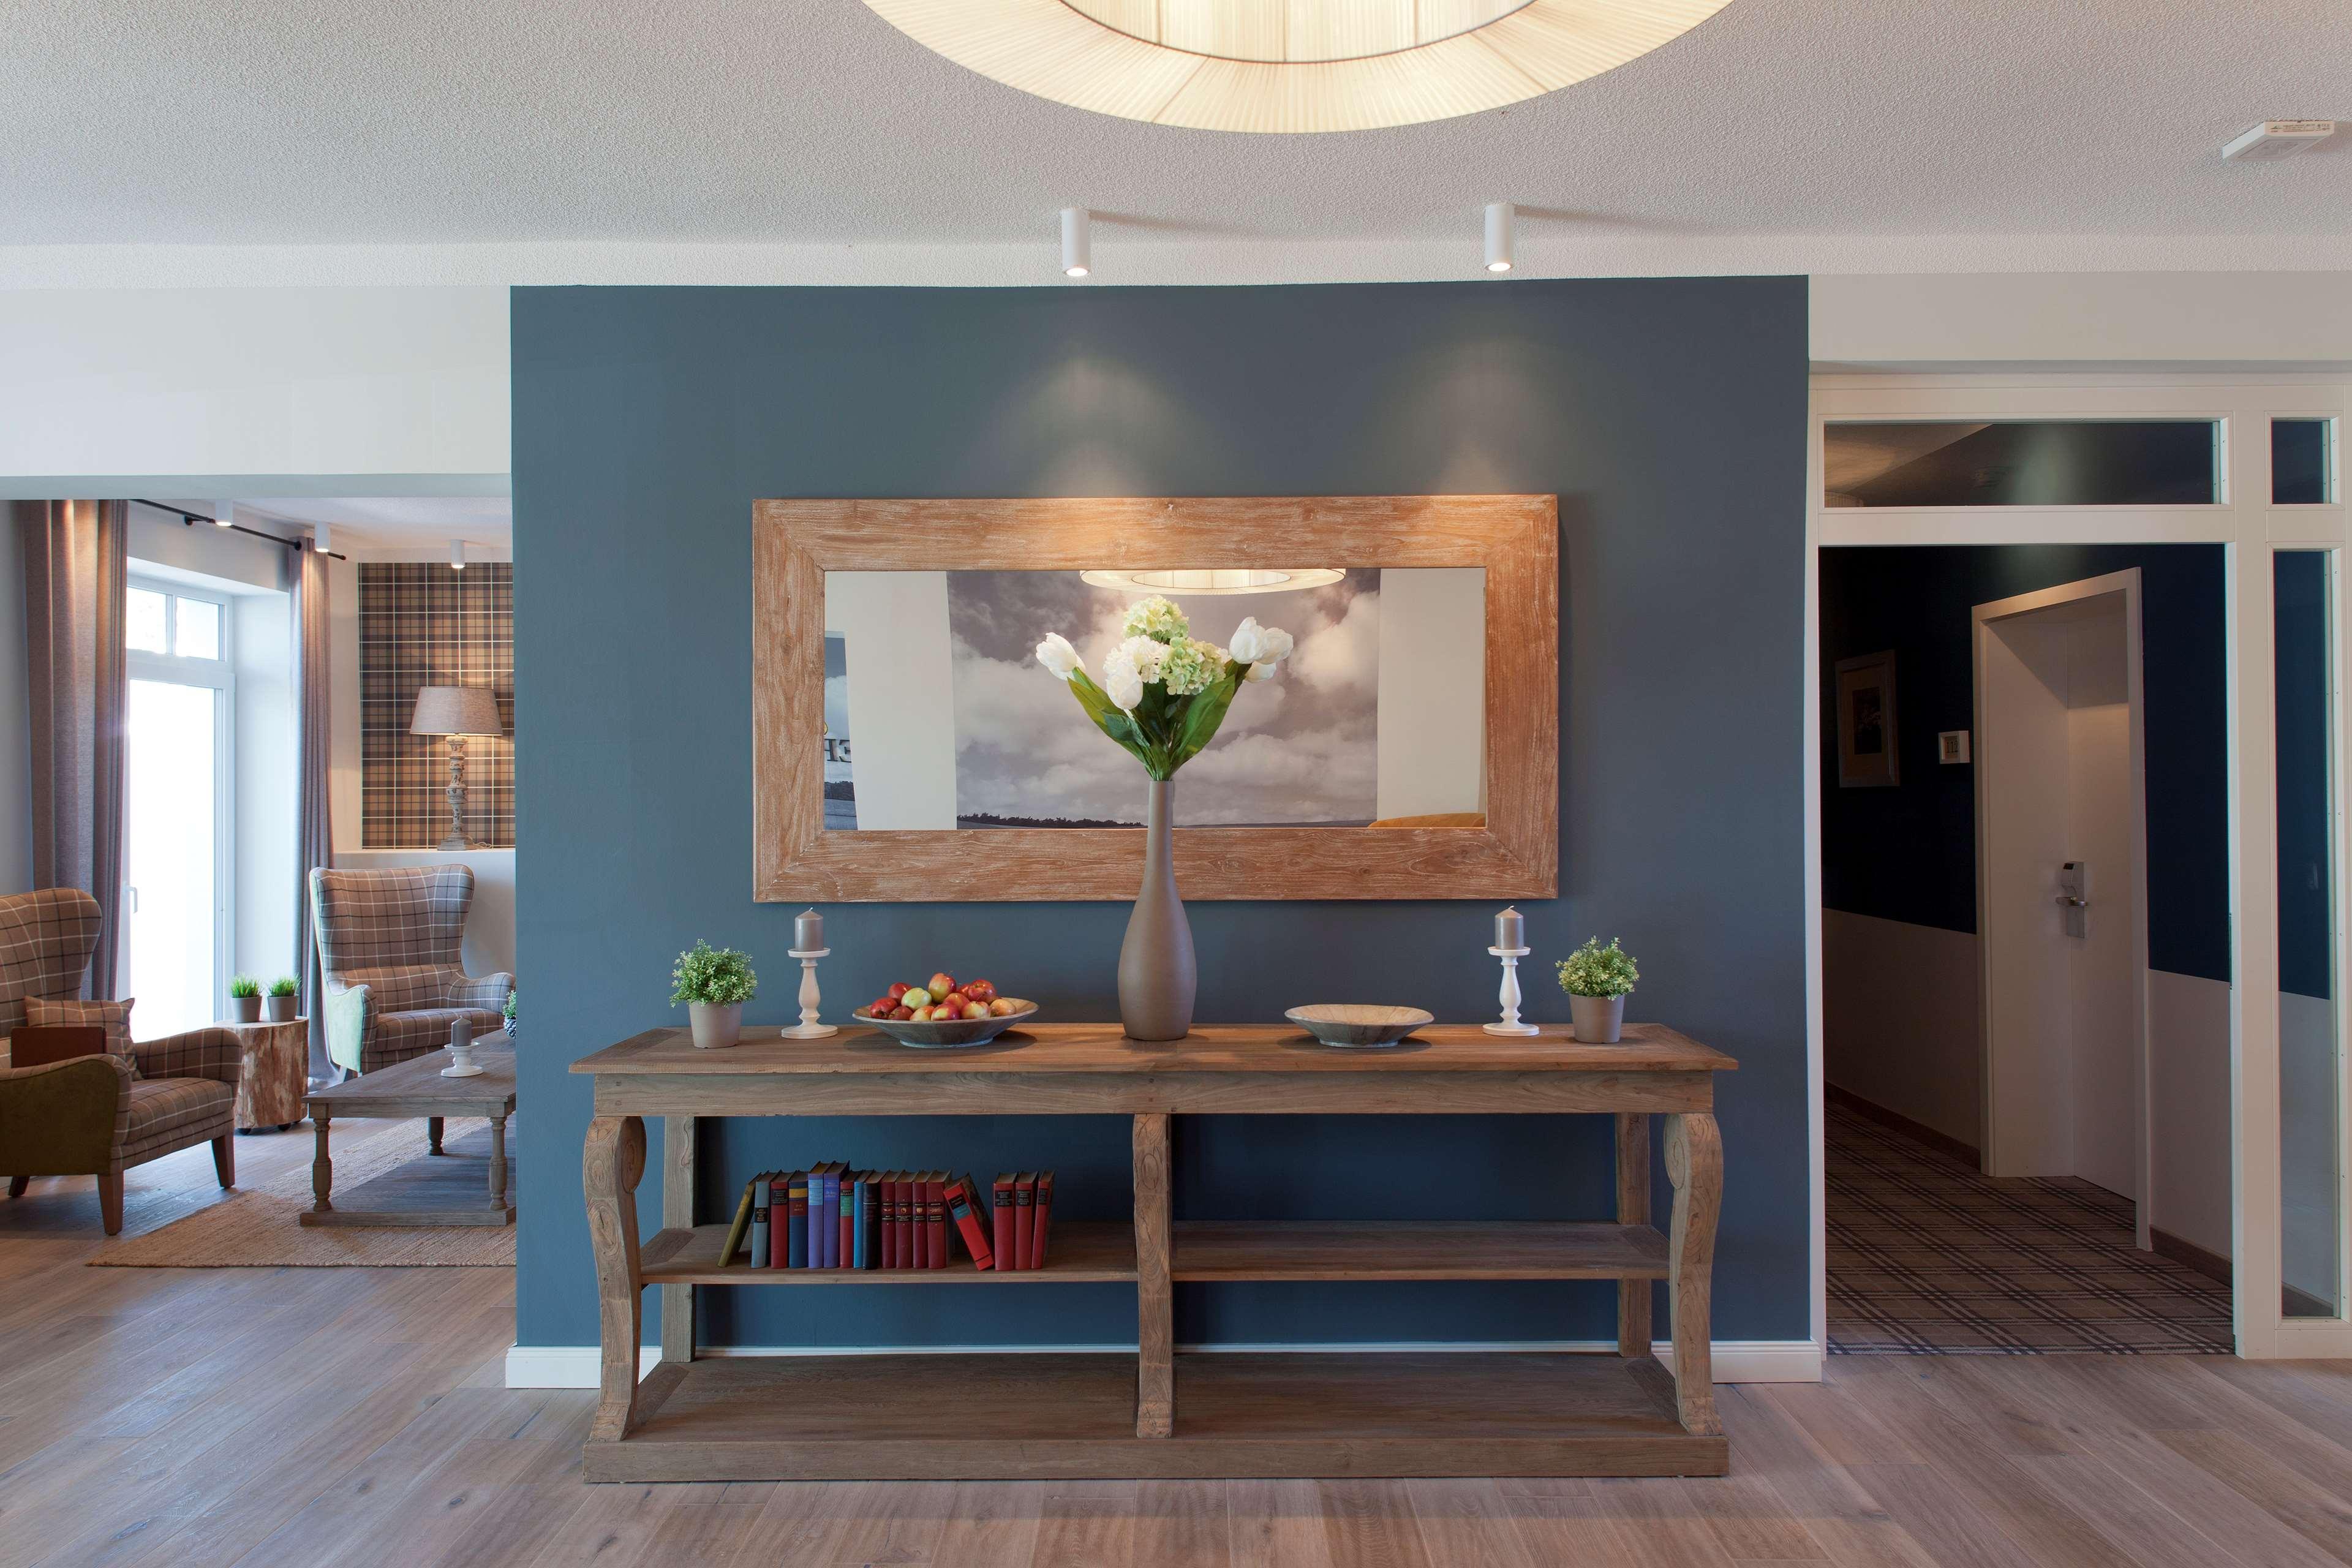 hotel in korswandt infobel deutschland. Black Bedroom Furniture Sets. Home Design Ideas